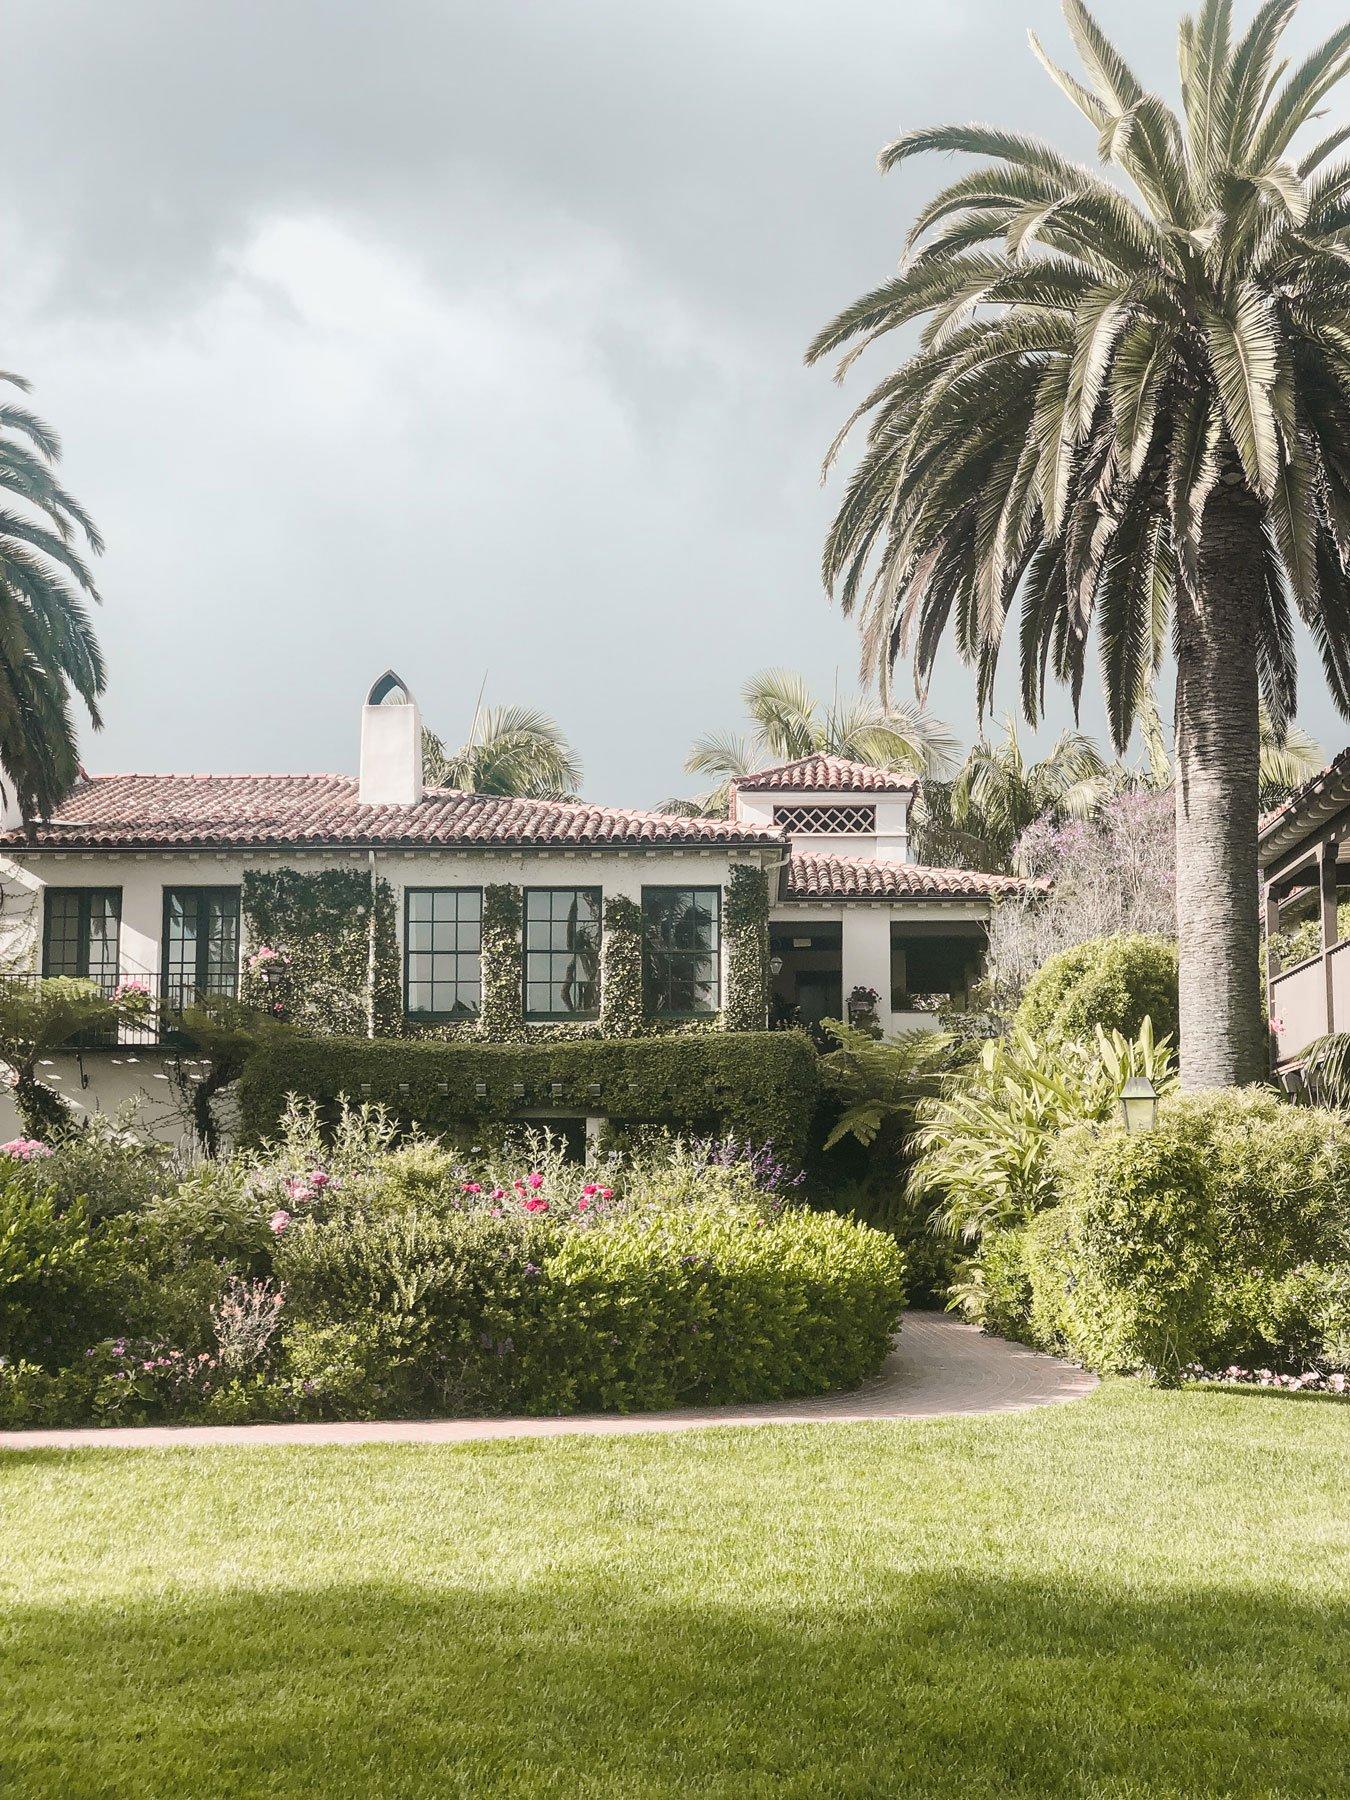 Four Seasons Santa Barbara grounds